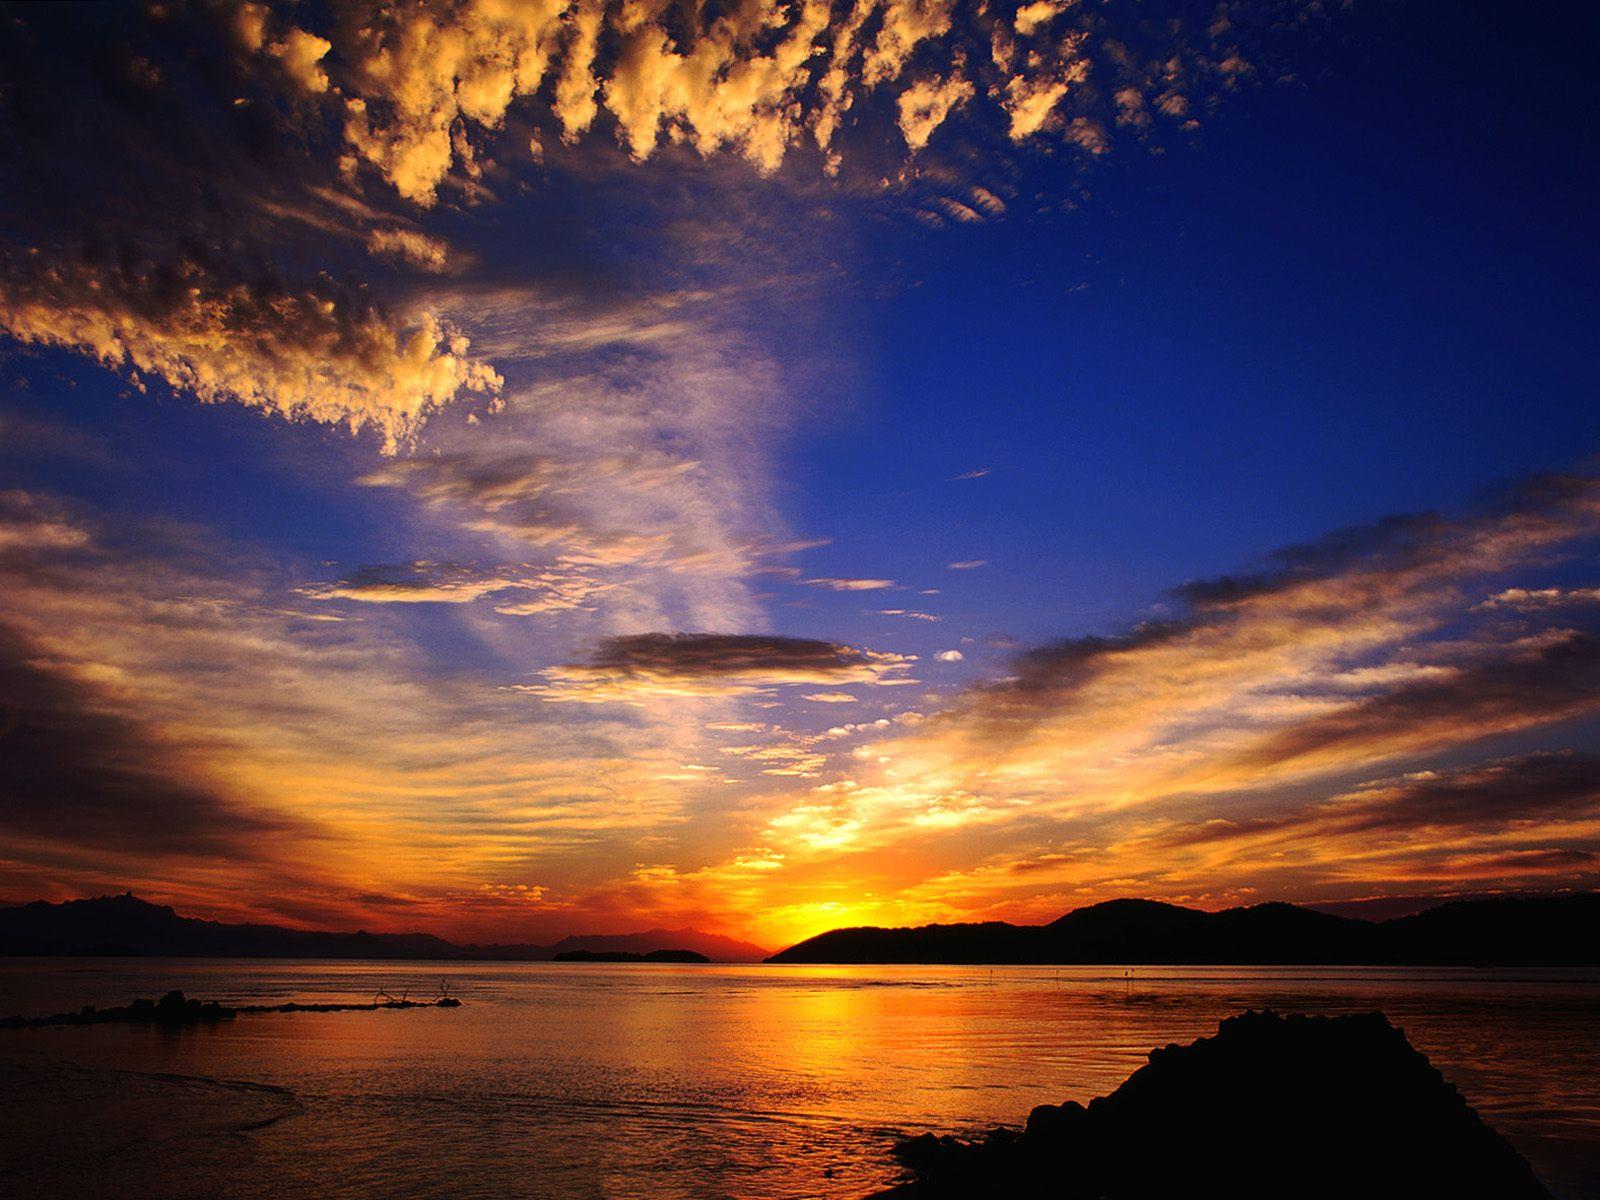 Sunset Wallpapers HD Sunset Wallpapers HD for Desktop 1600x1200